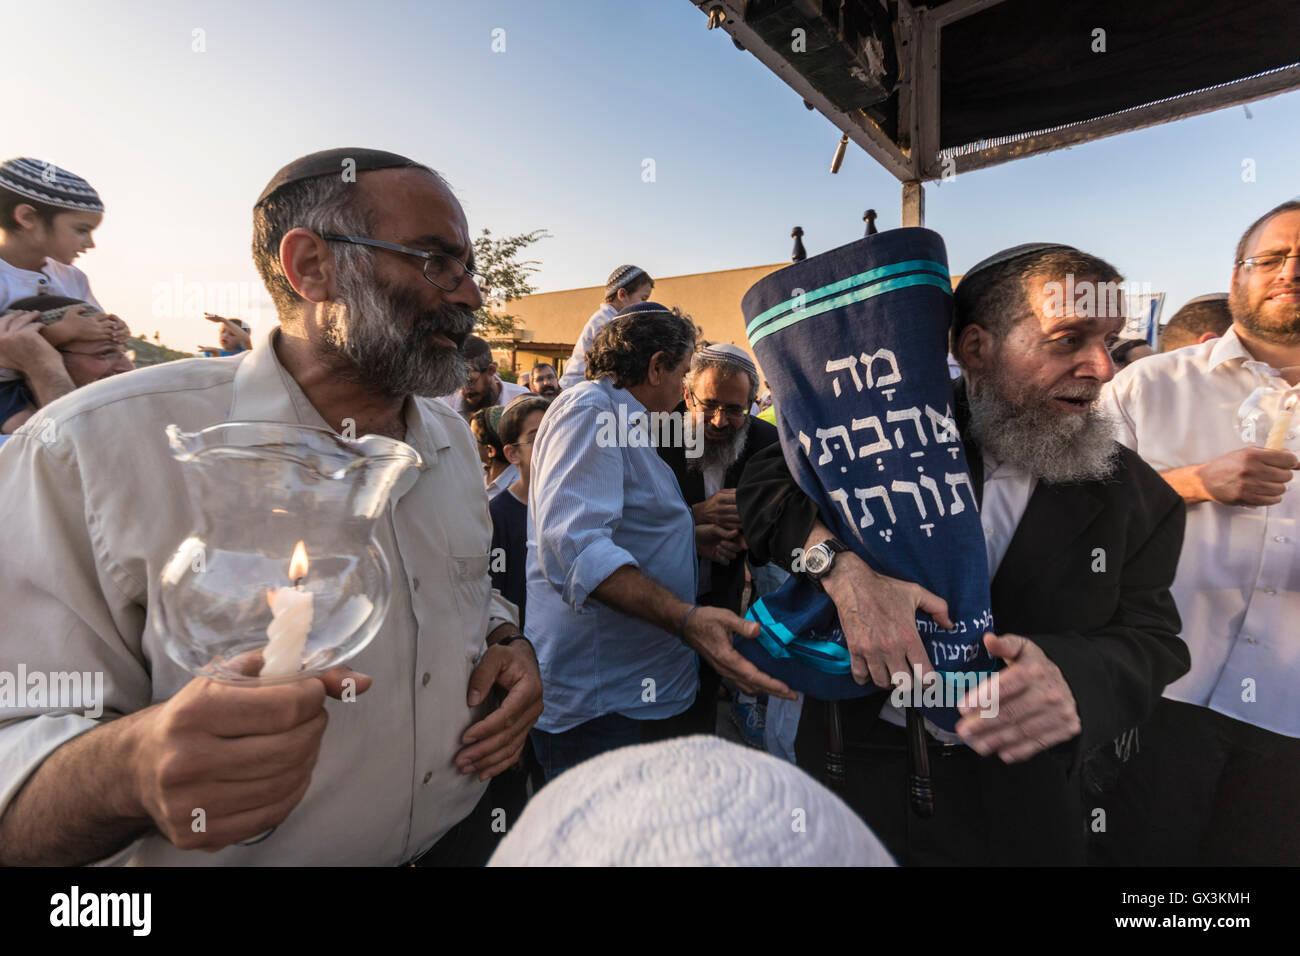 Neria, Israel. 15th September, 2016. Rabbi Yehuda Henkin, a prominent Israeli Rabbi, carries the Torah scroll (Bible/ - Stock Image